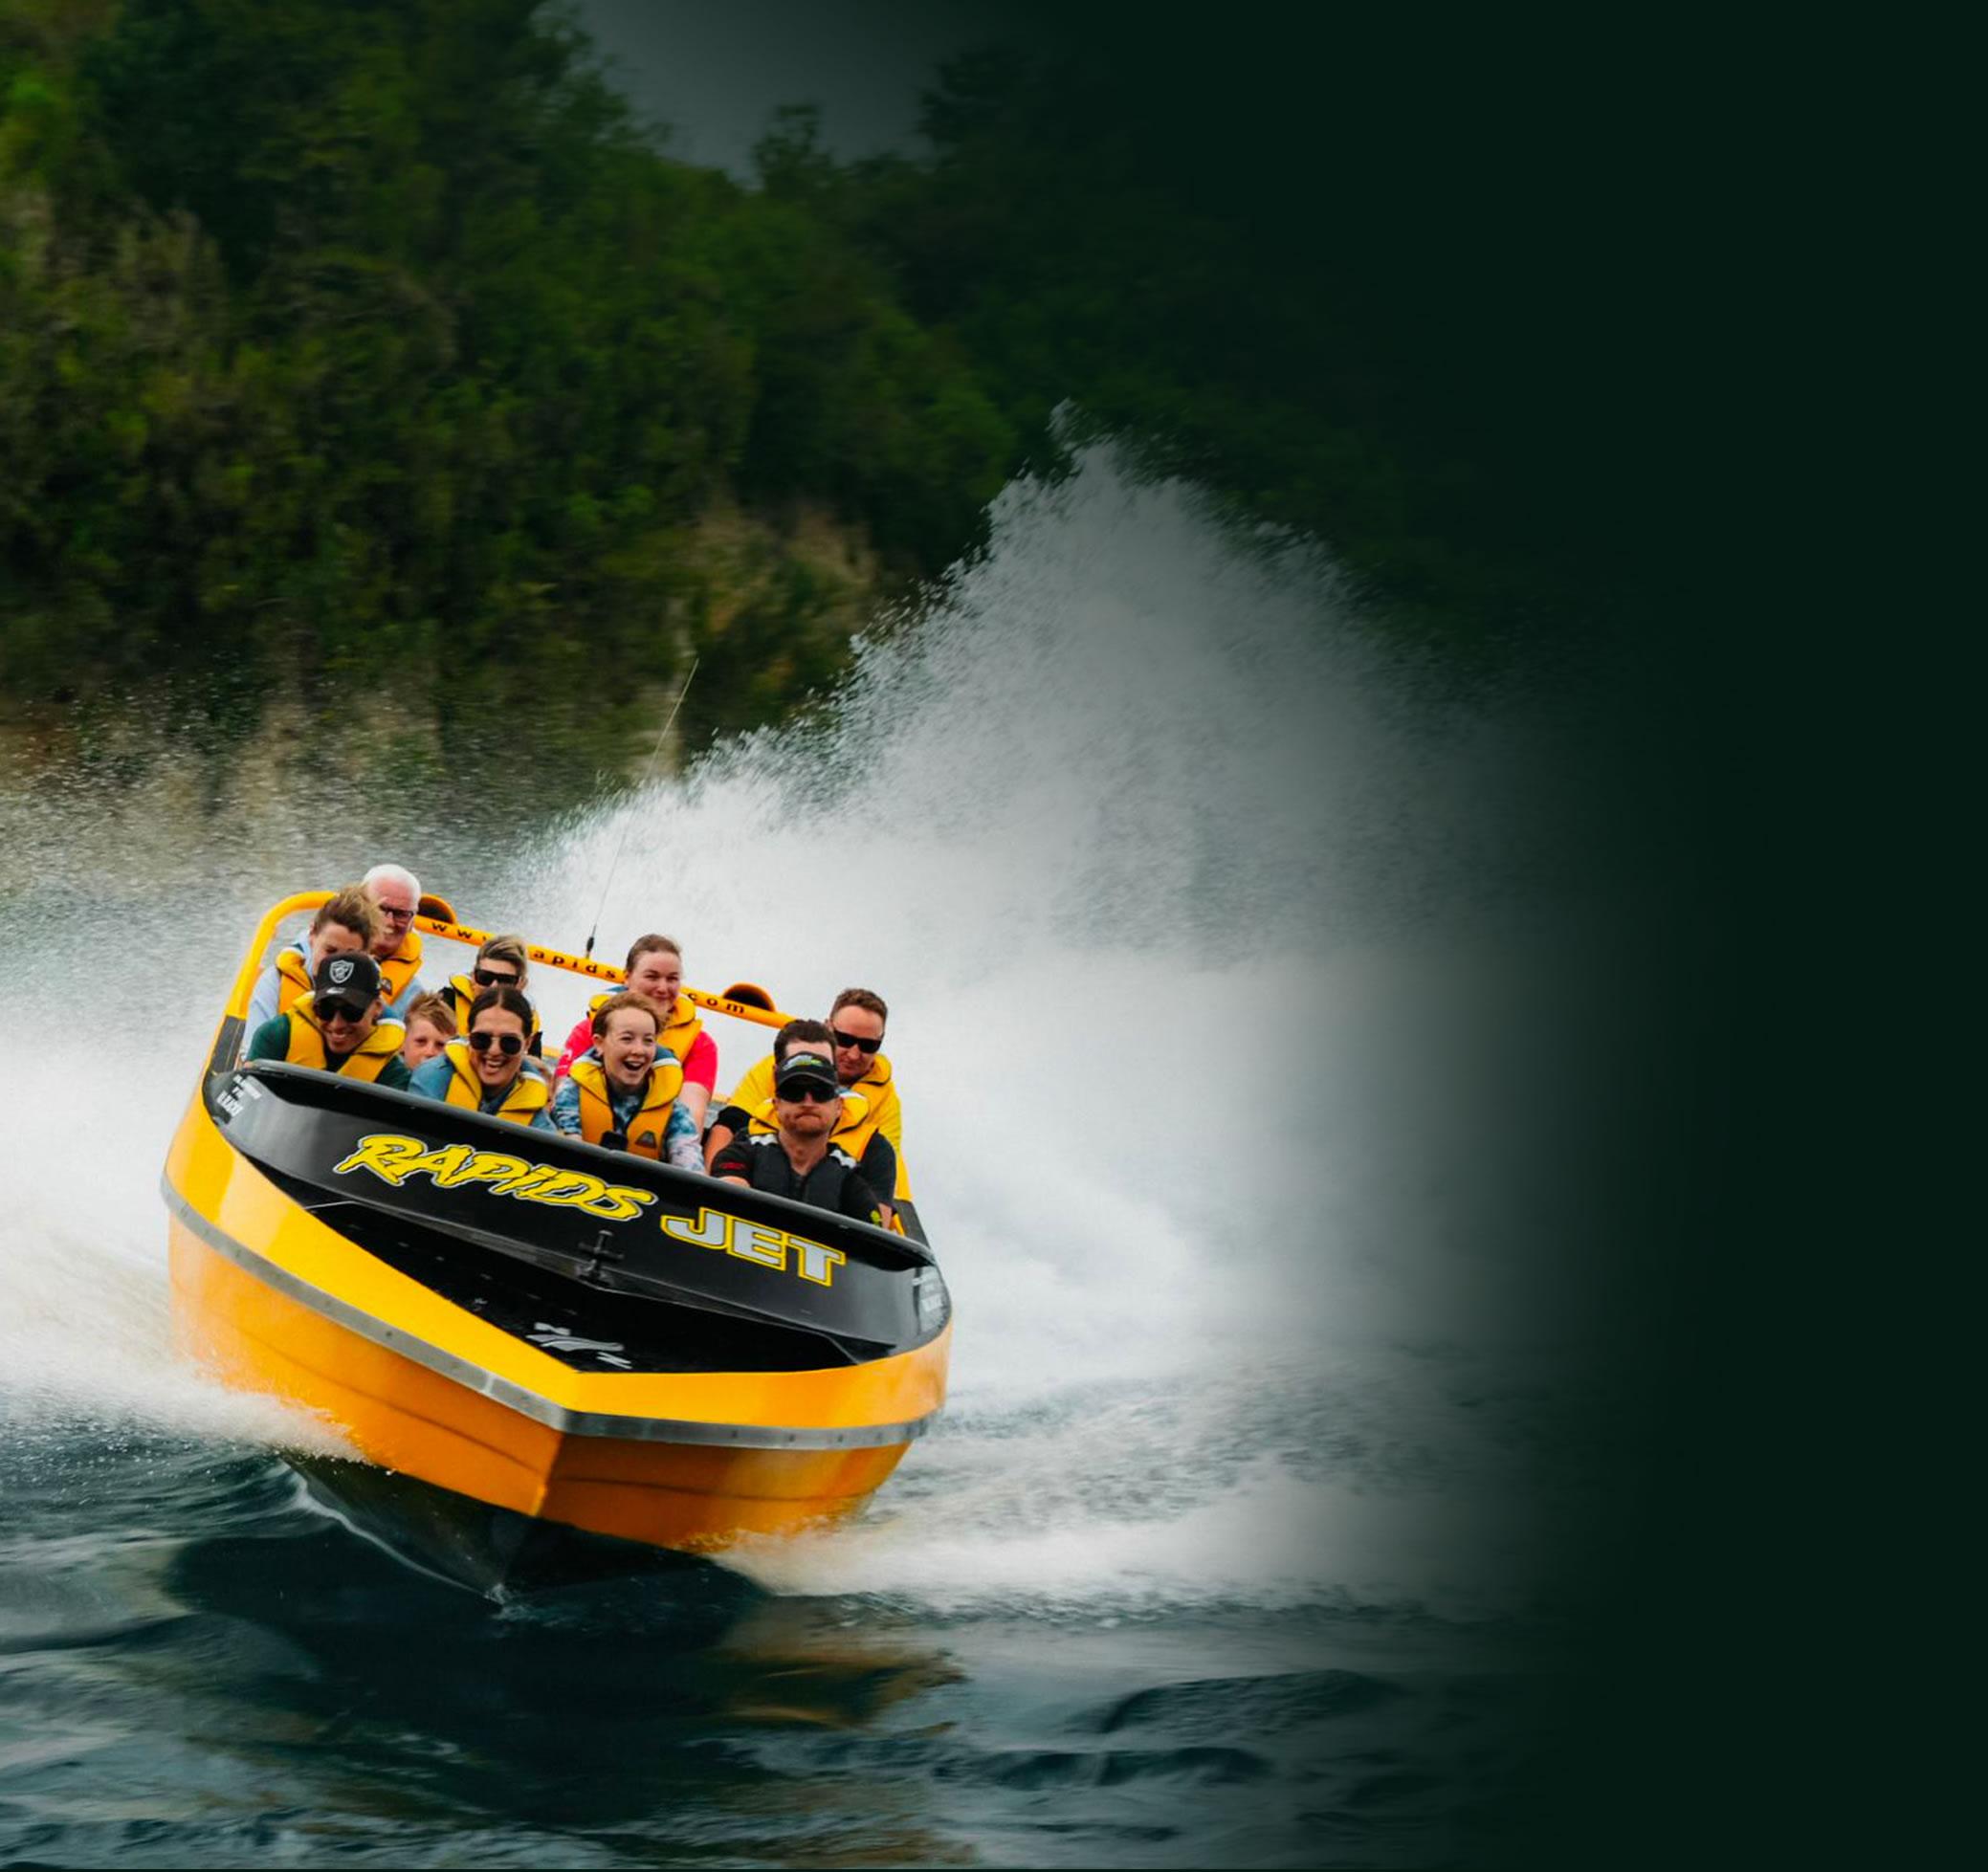 River Cruise - Rapids Jet